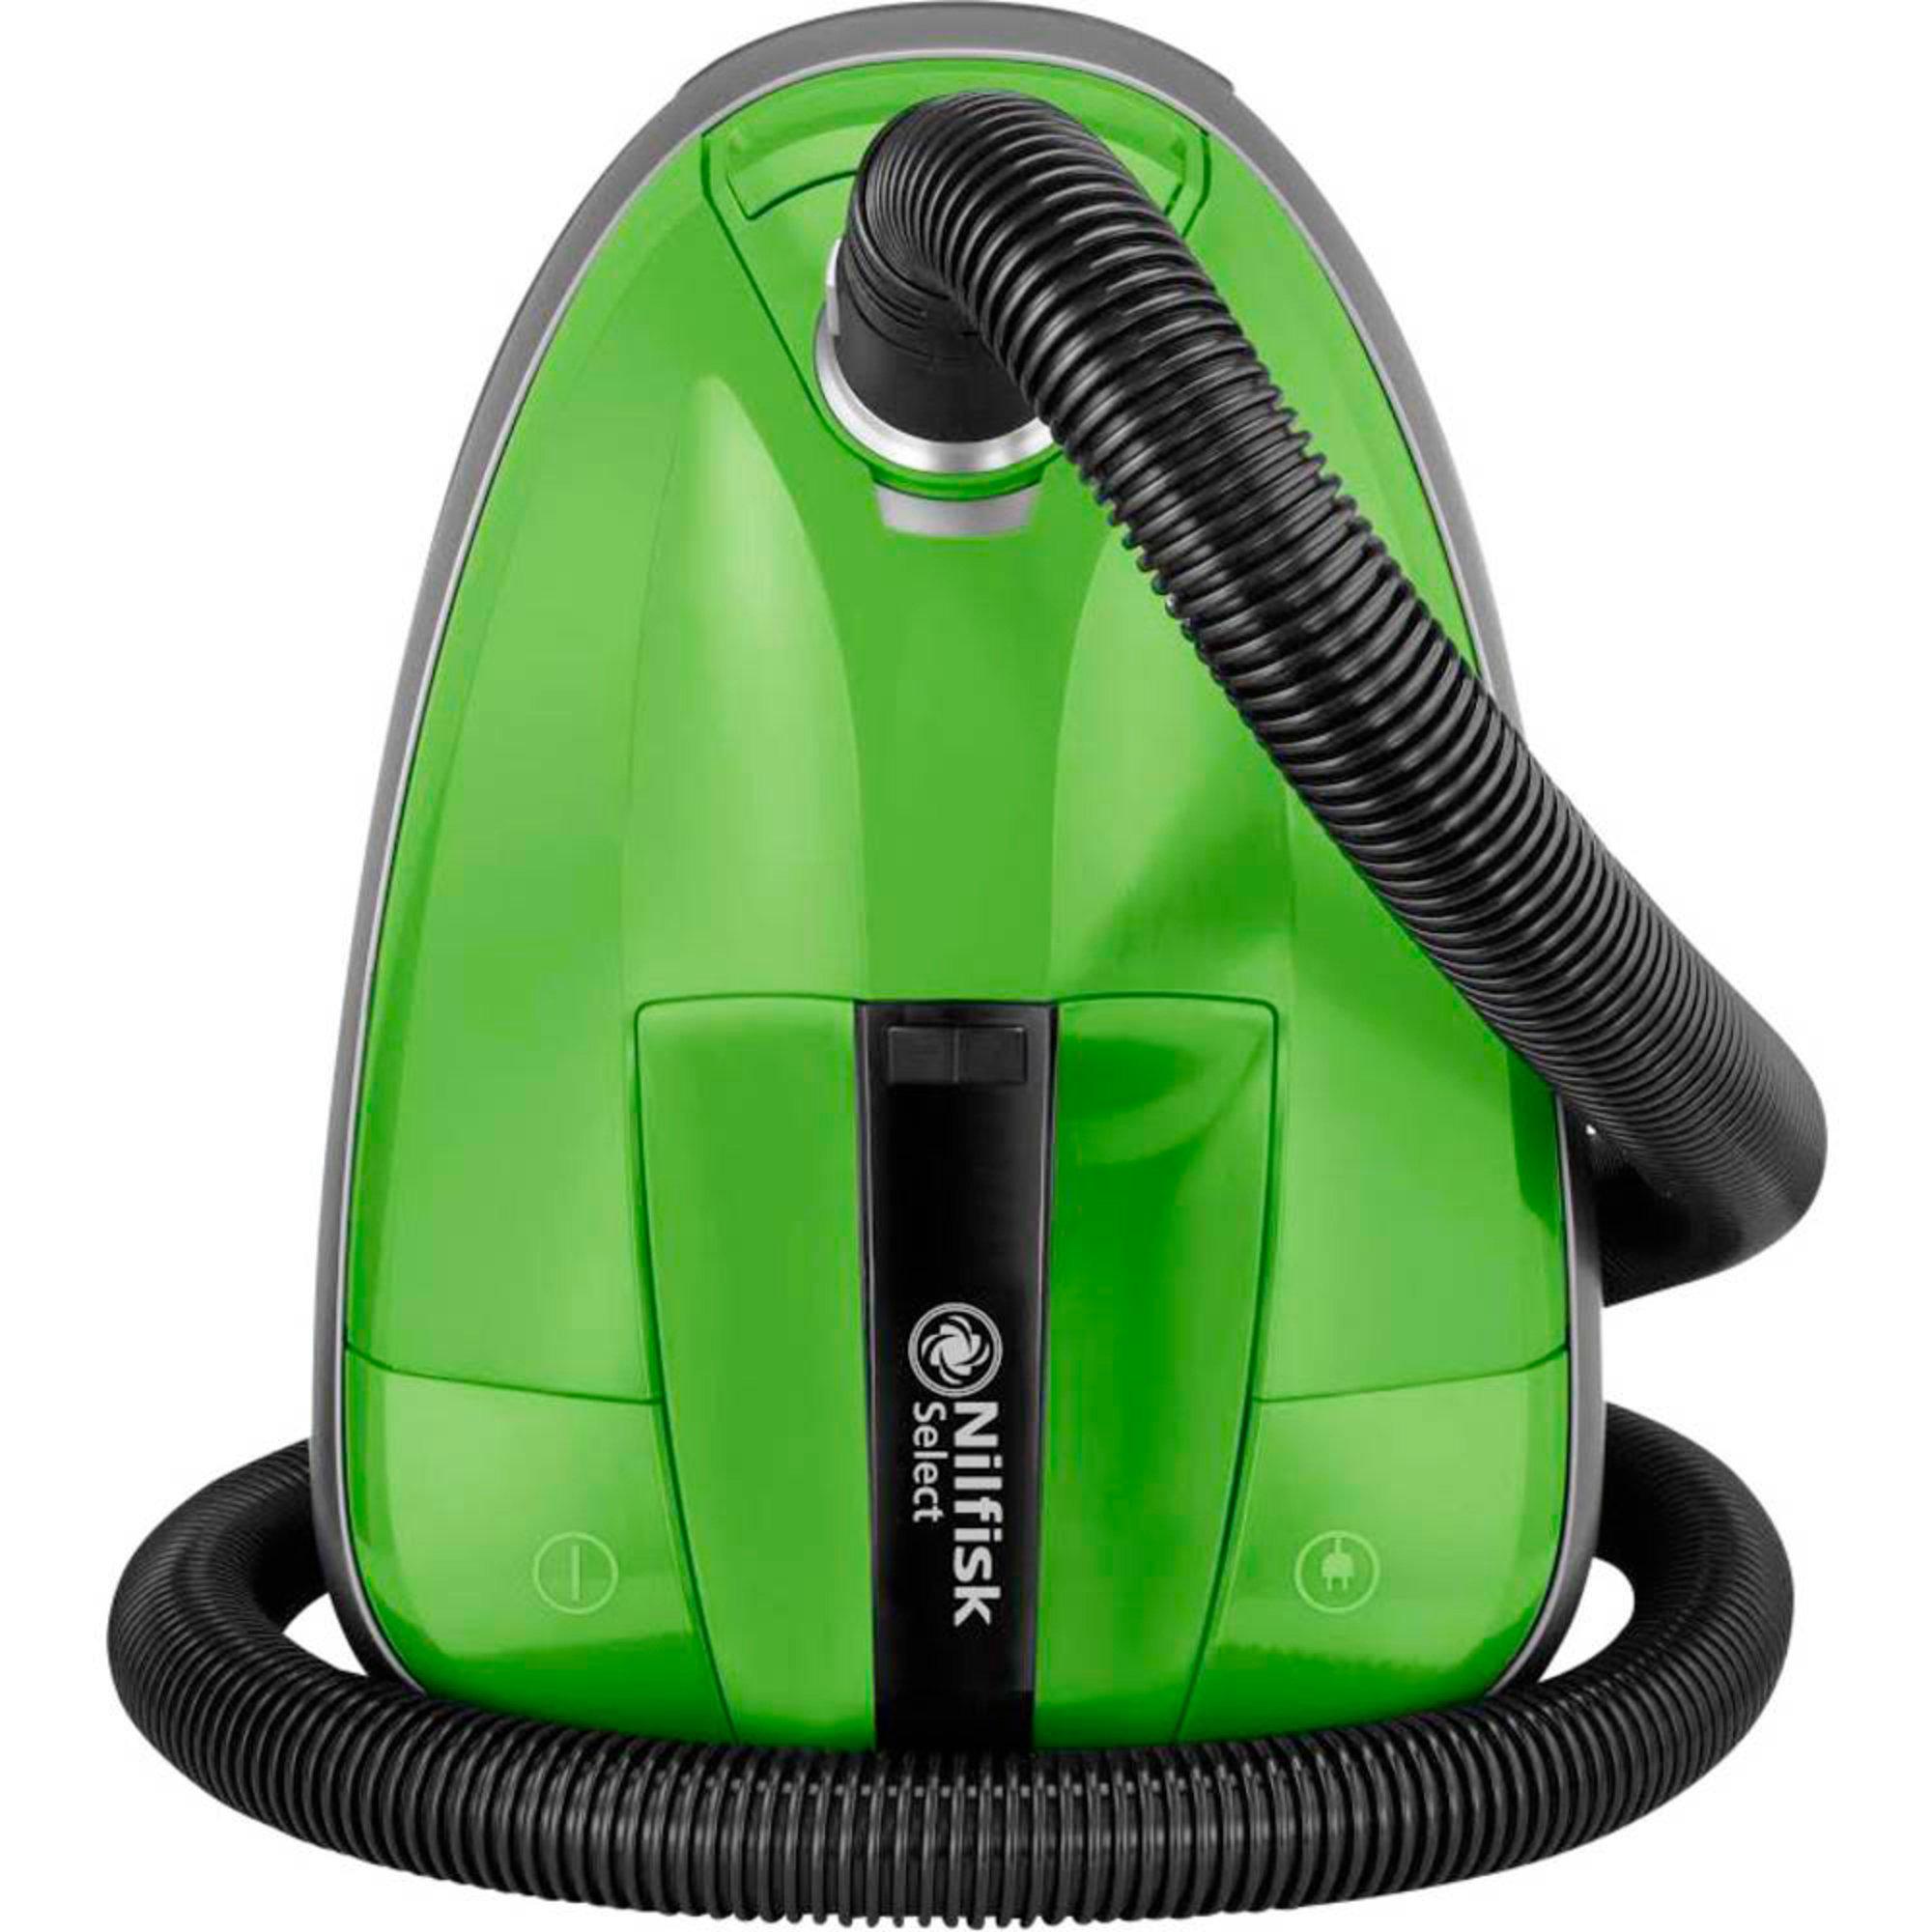 Nilfisk Select Classic Green Dammsugare k1